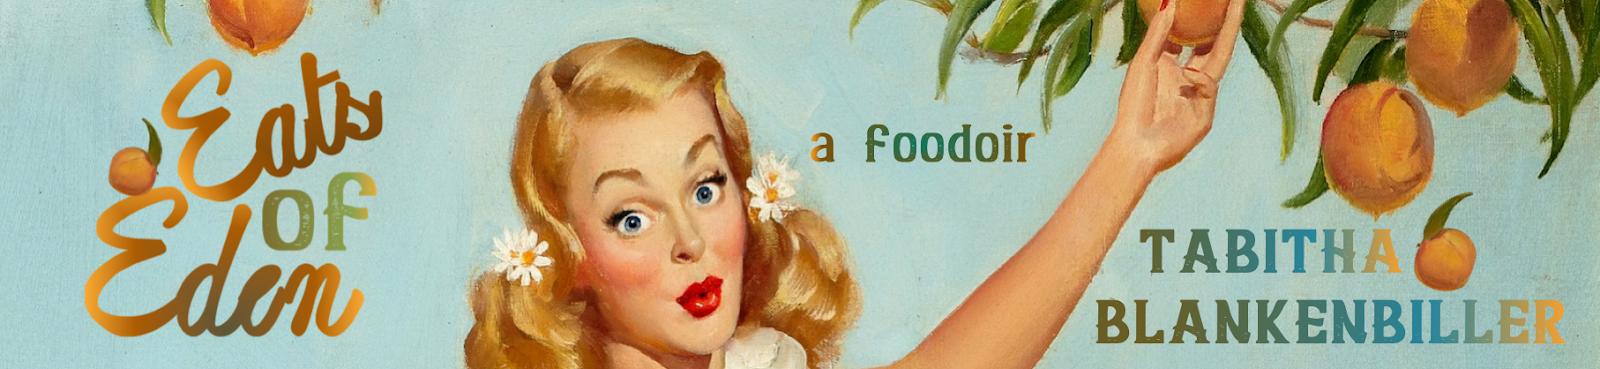 Eats of Eden header banner